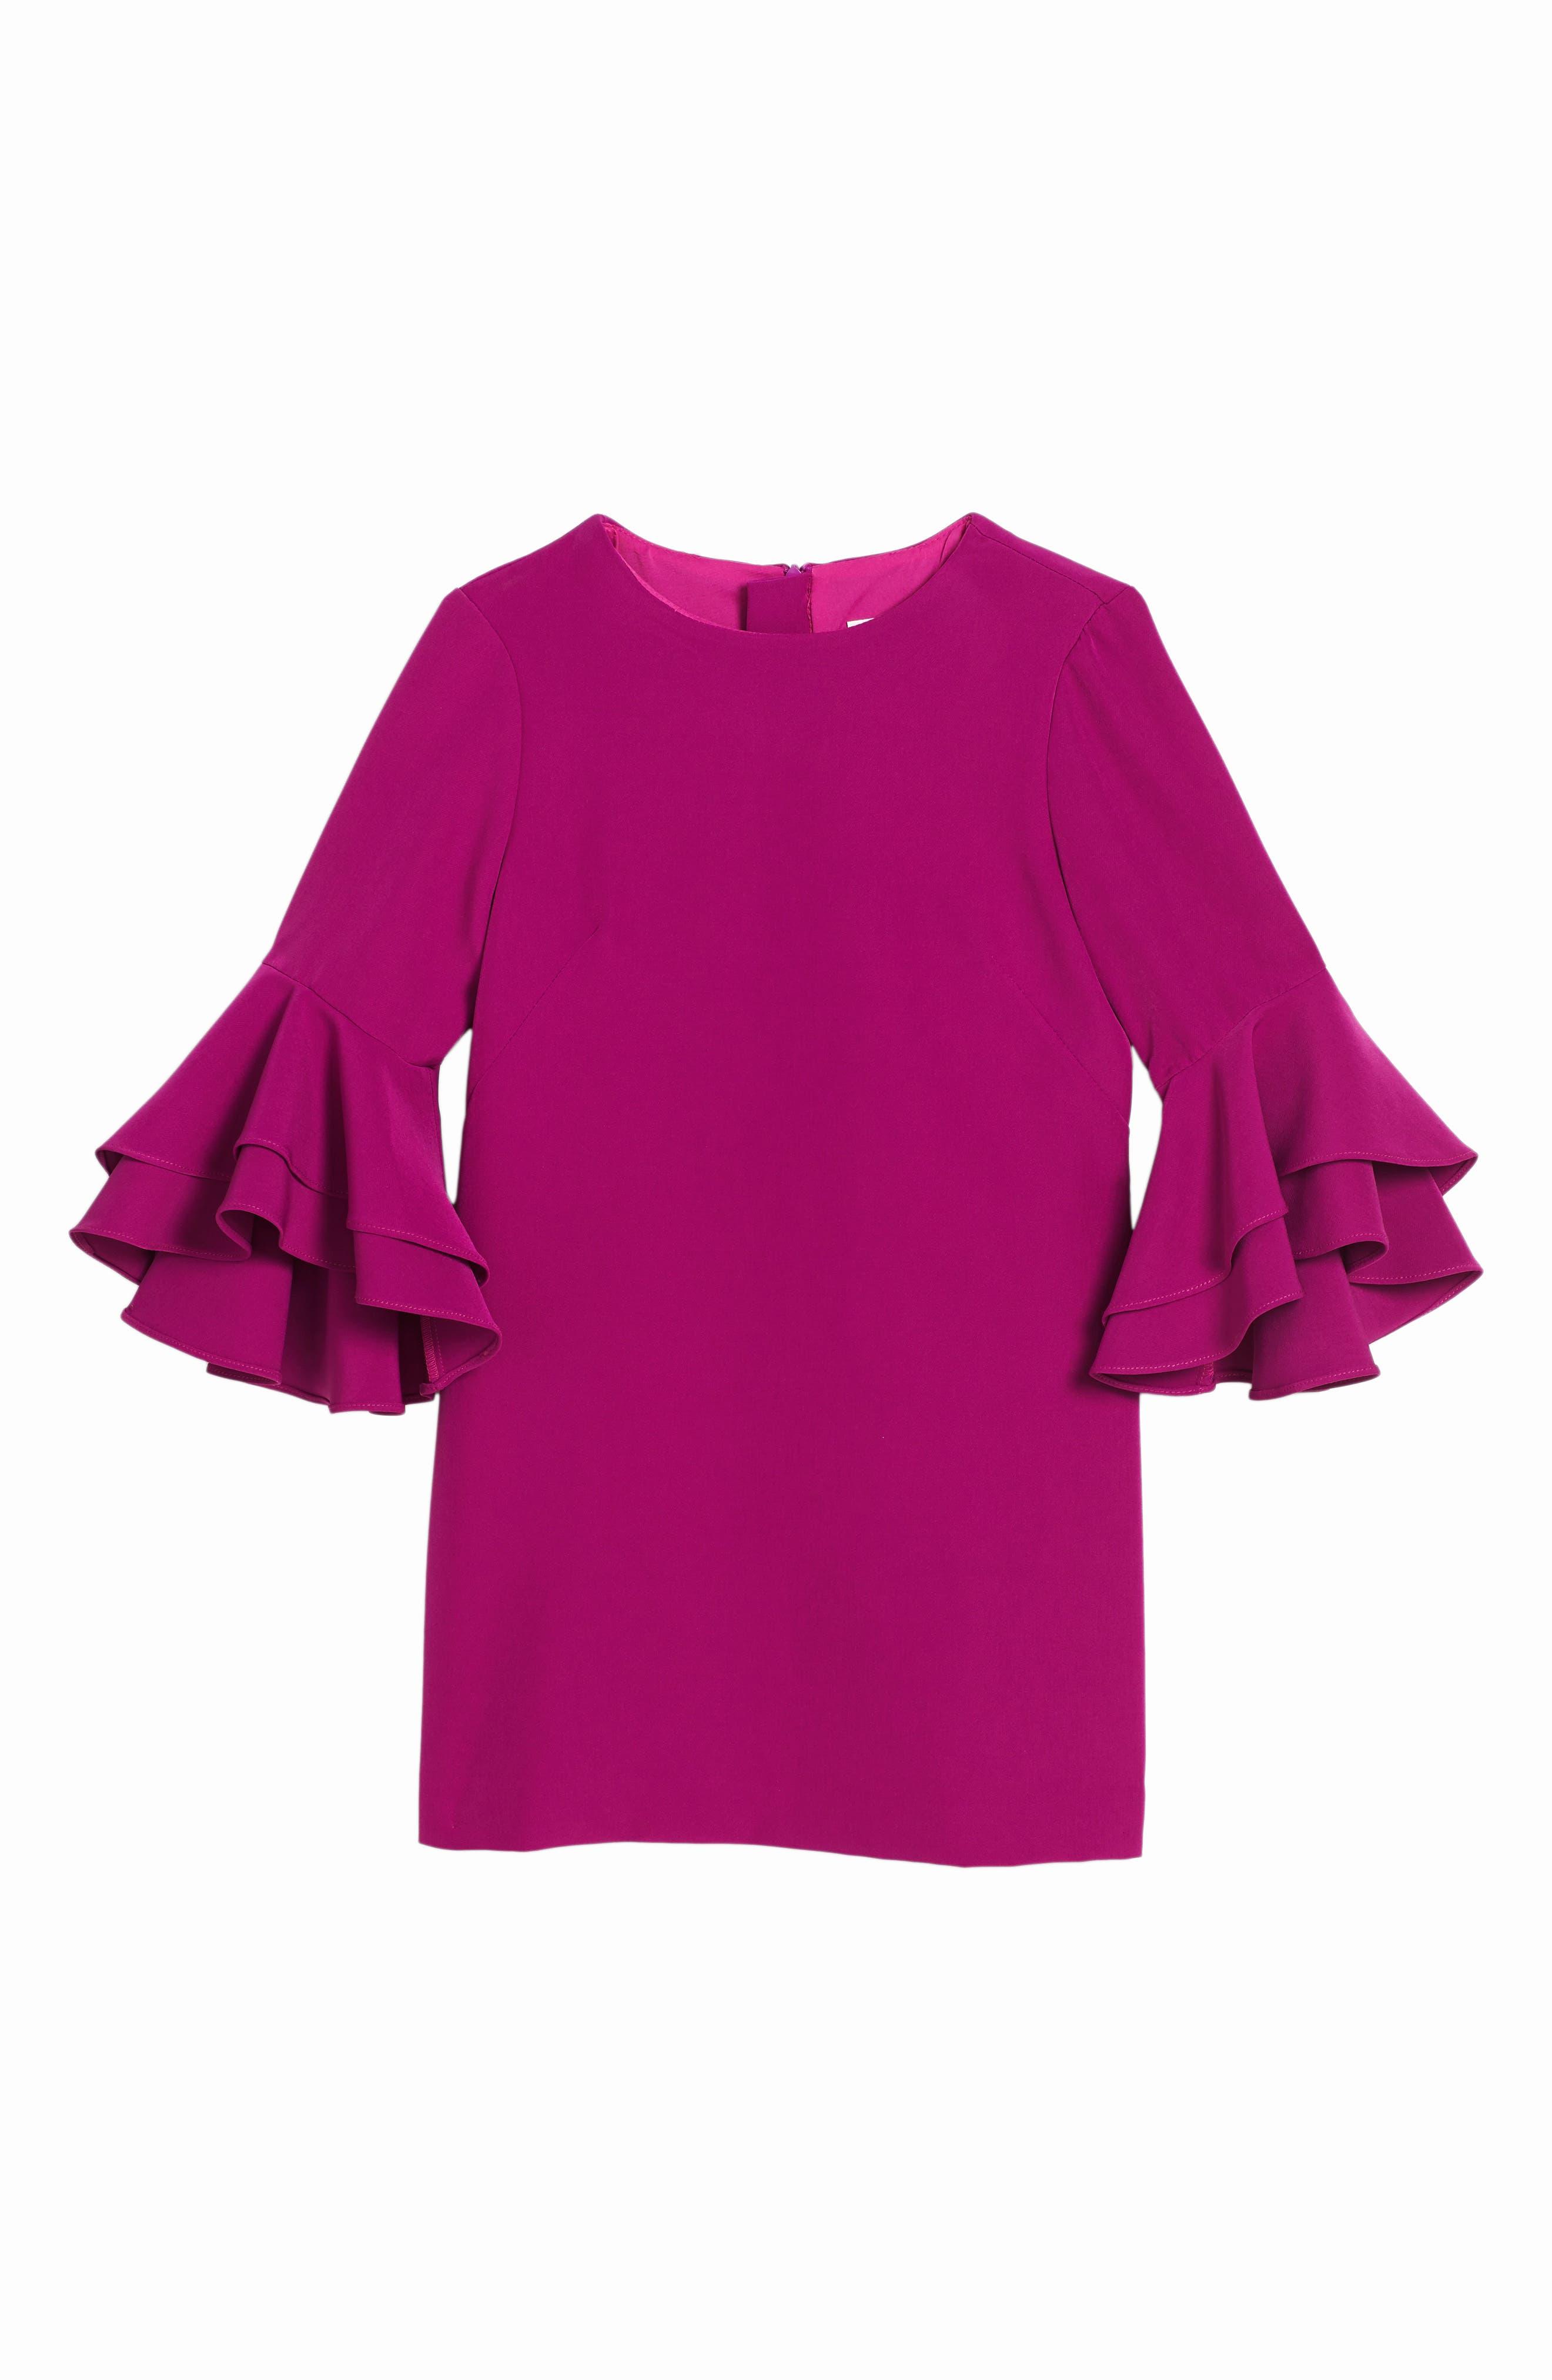 Alternate Image 1 Selected - Milly Minis Nicola Dress (Big Girls)